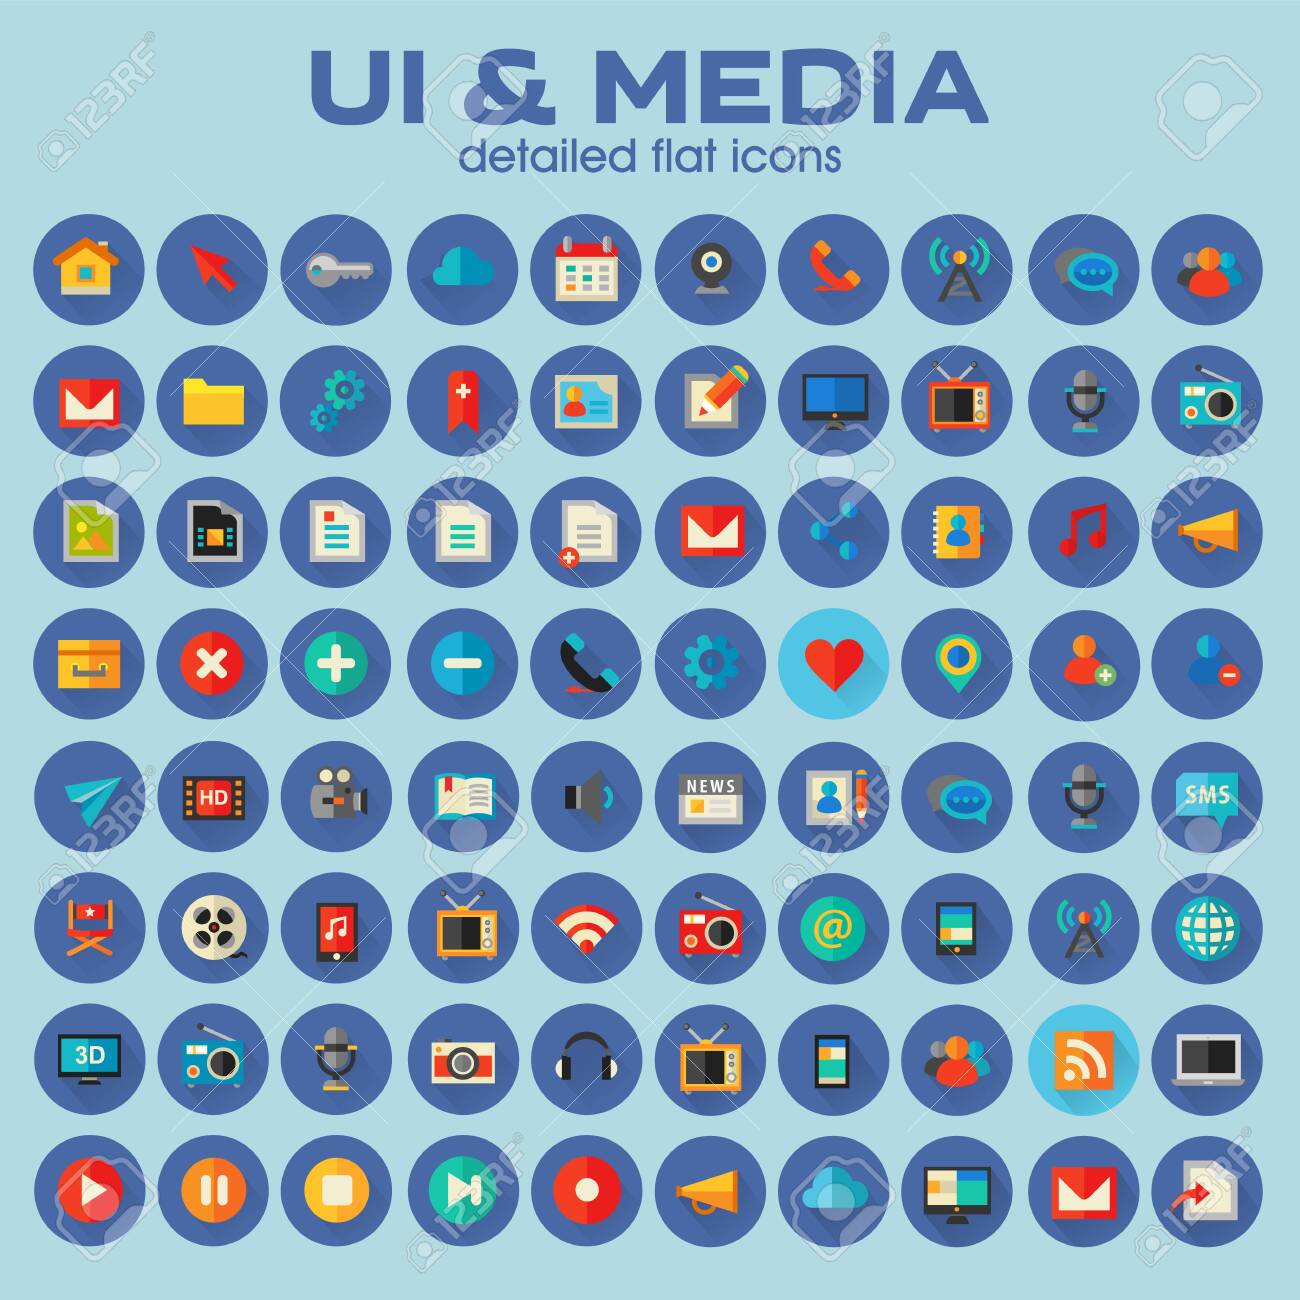 Ui and Multimedia big icon set, trendy flat icons - 134880070